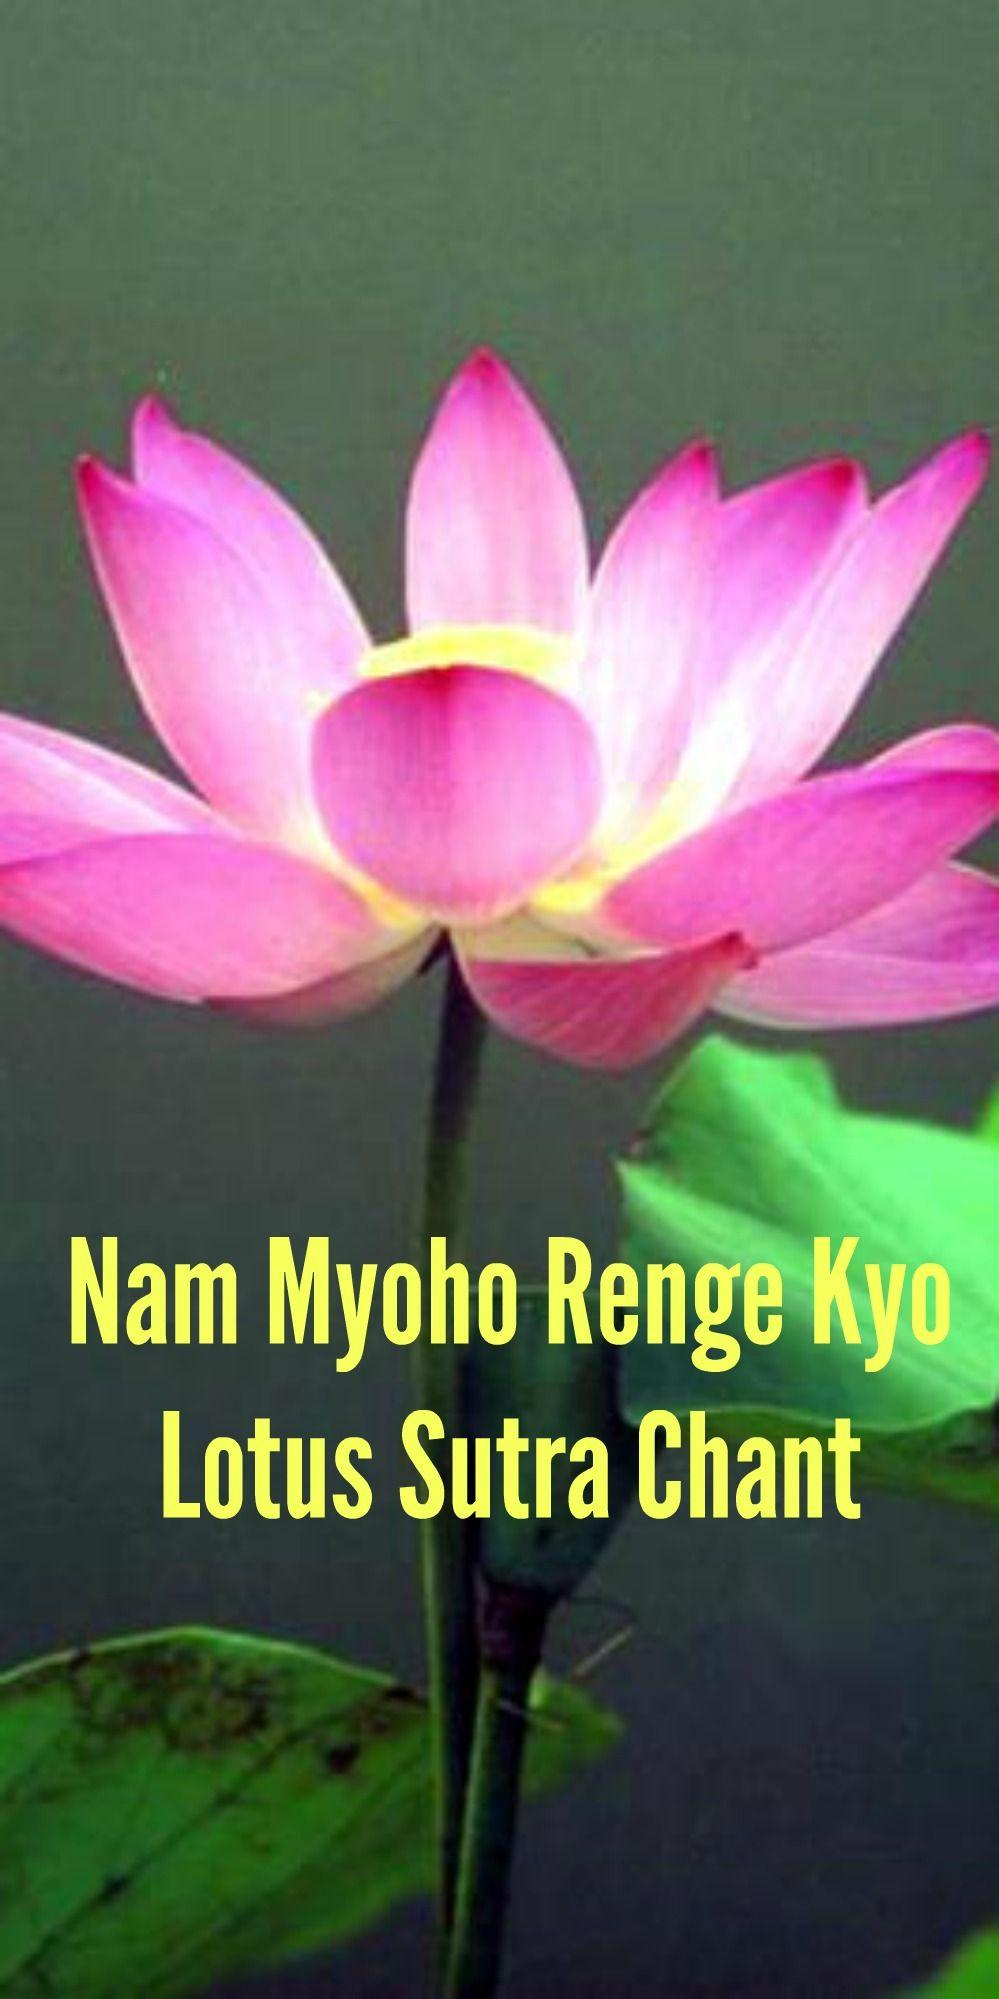 Nam Myoho Renge Kyo Lotus Sutra Chant Lyrics, Meaning